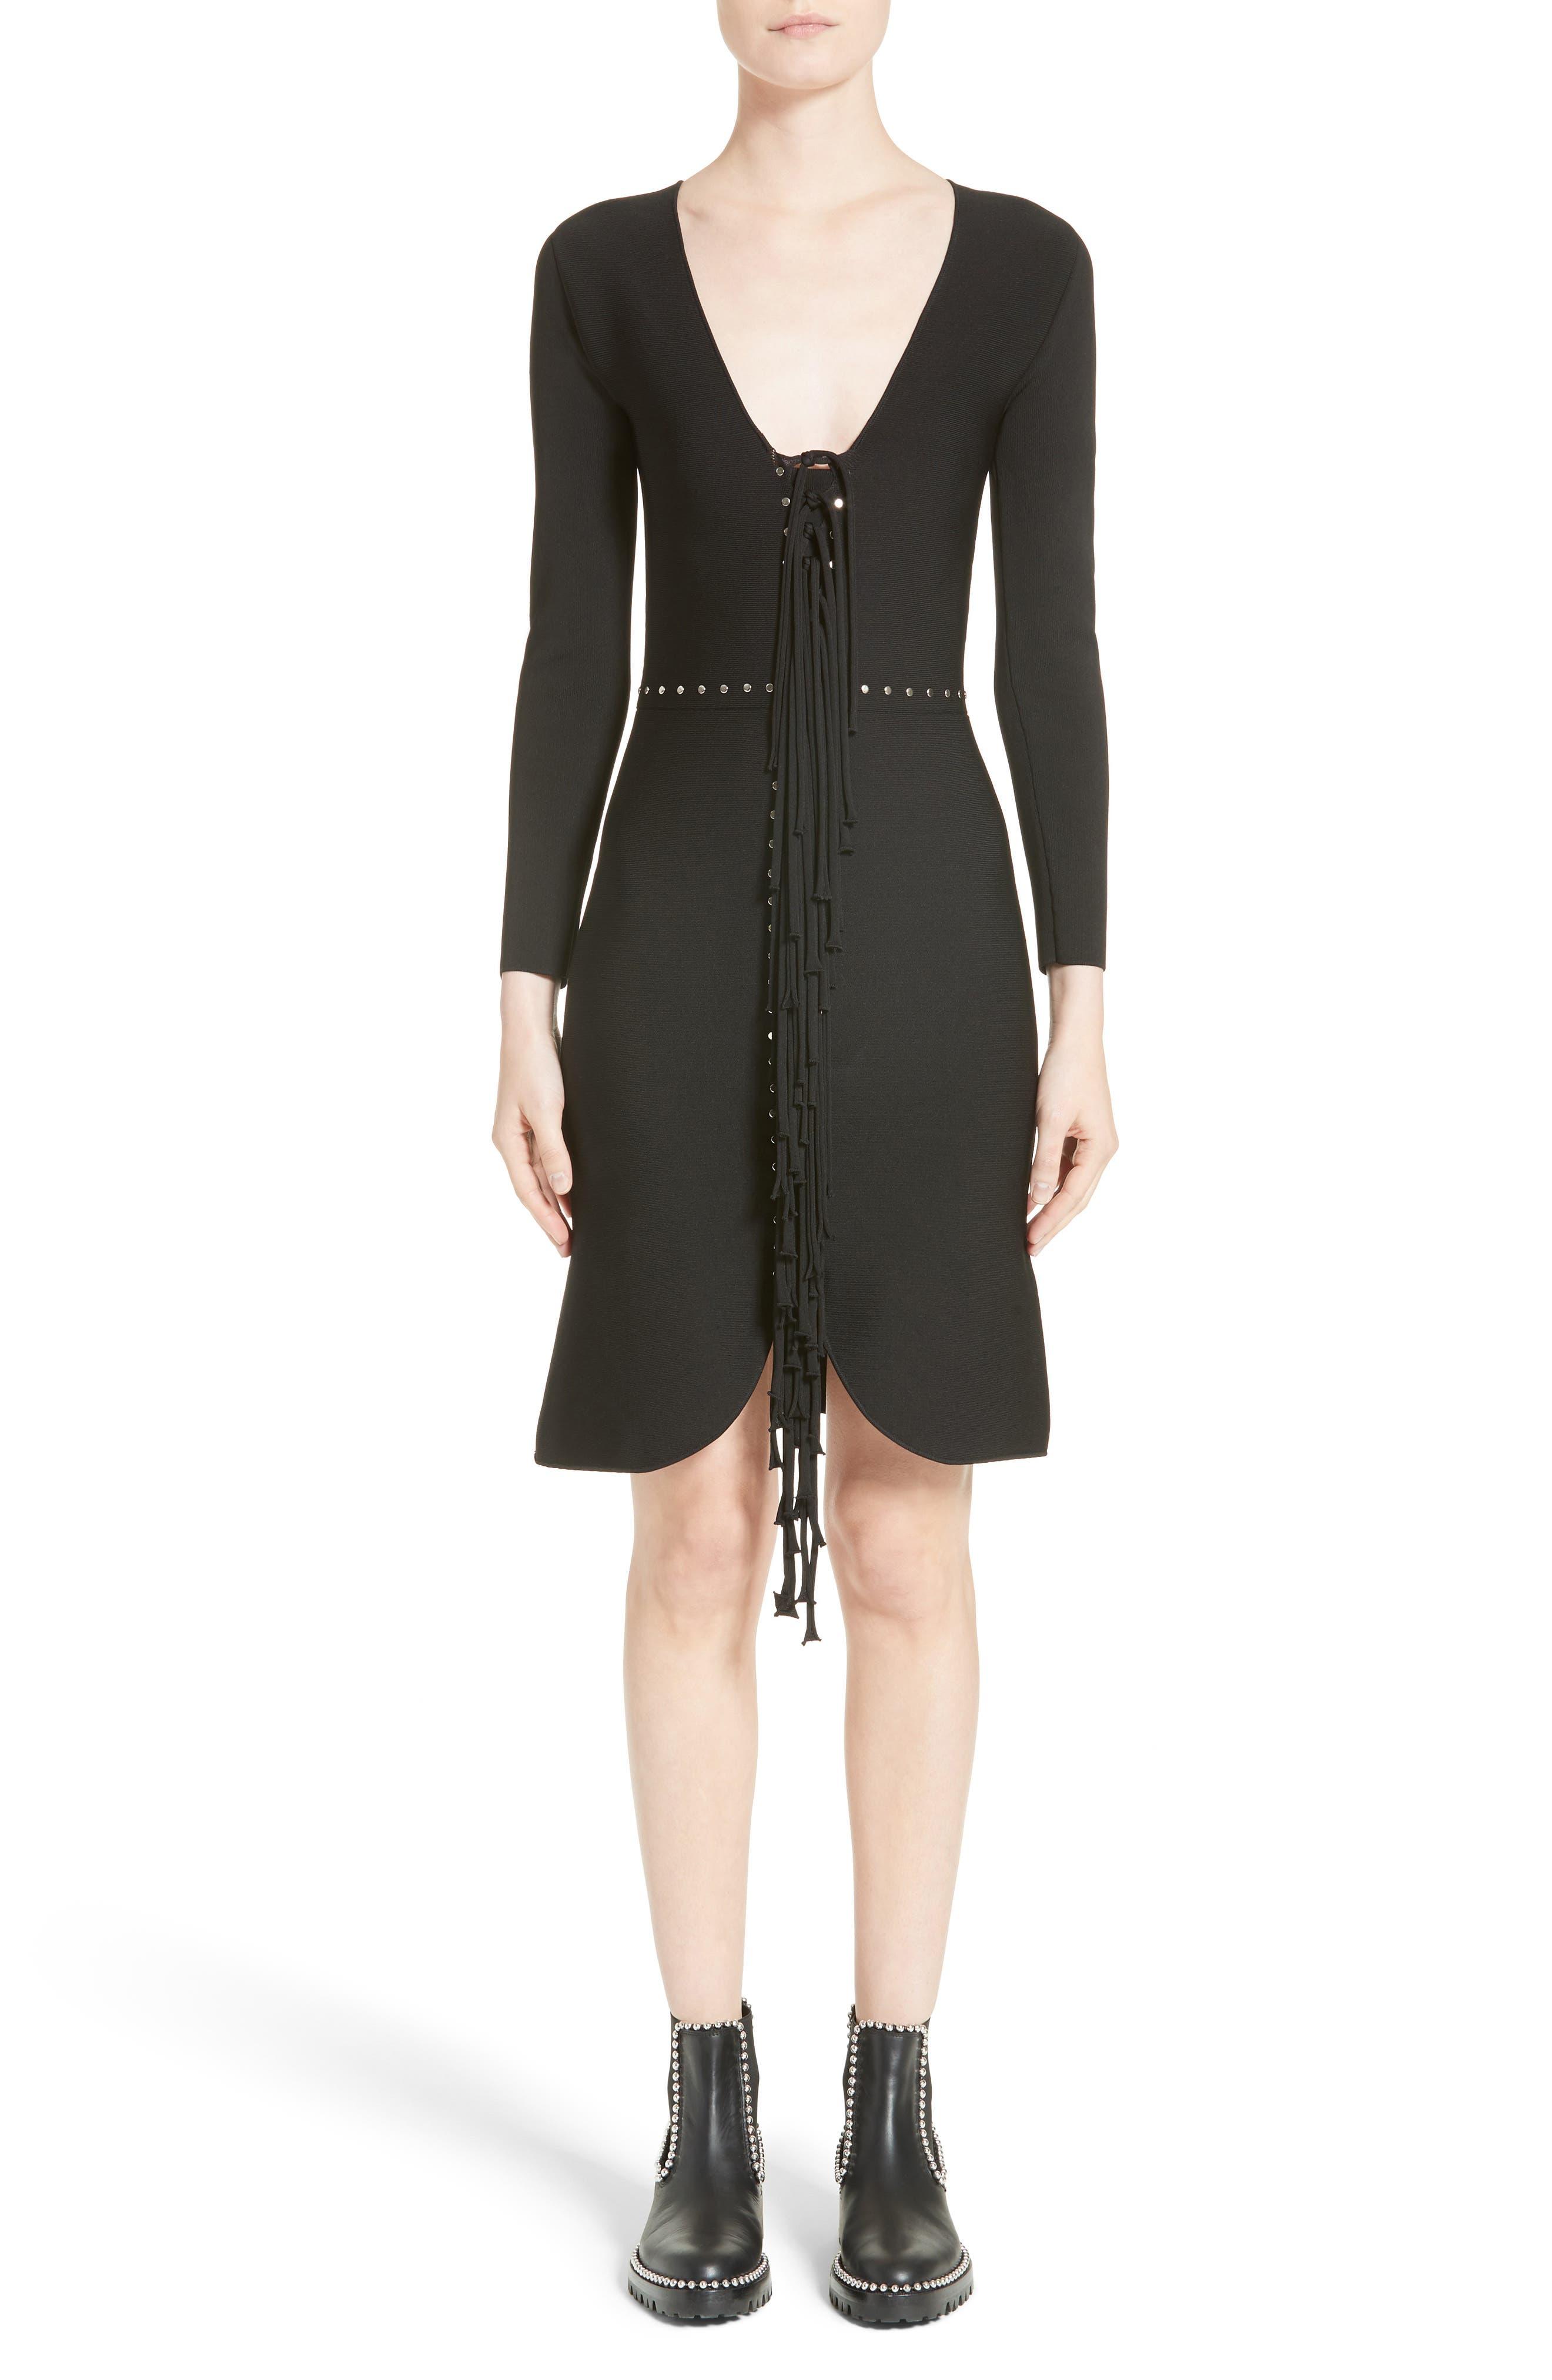 Main Image - Alexander Wang Knotted Fringe Knit Dress